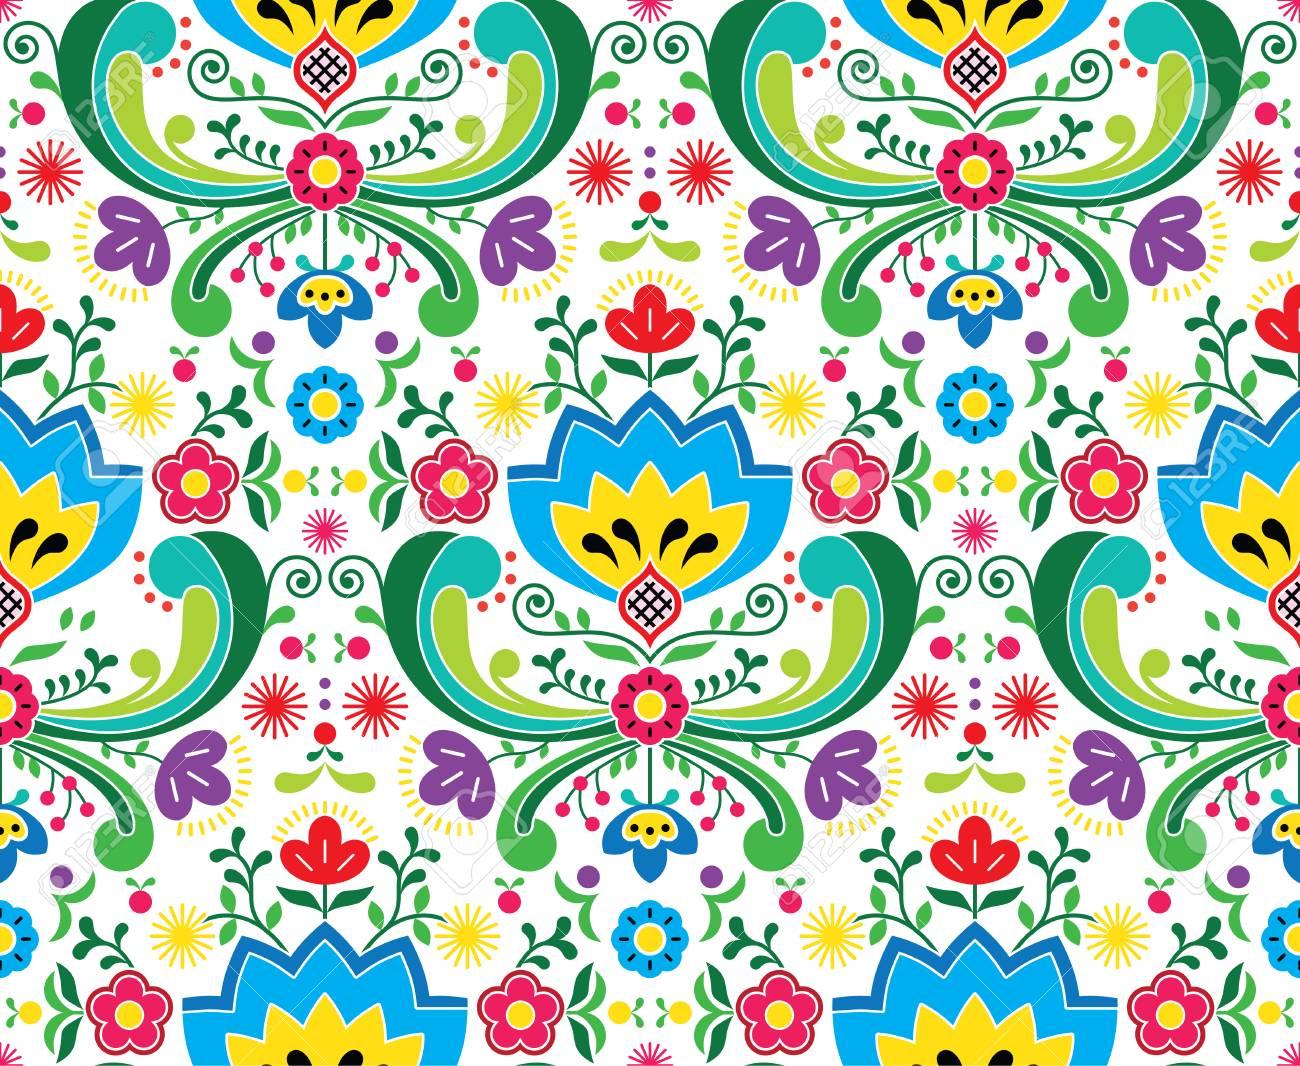 Norwegian folk art vector seamless pattern - Rosemaling style embroidery design - 89707079